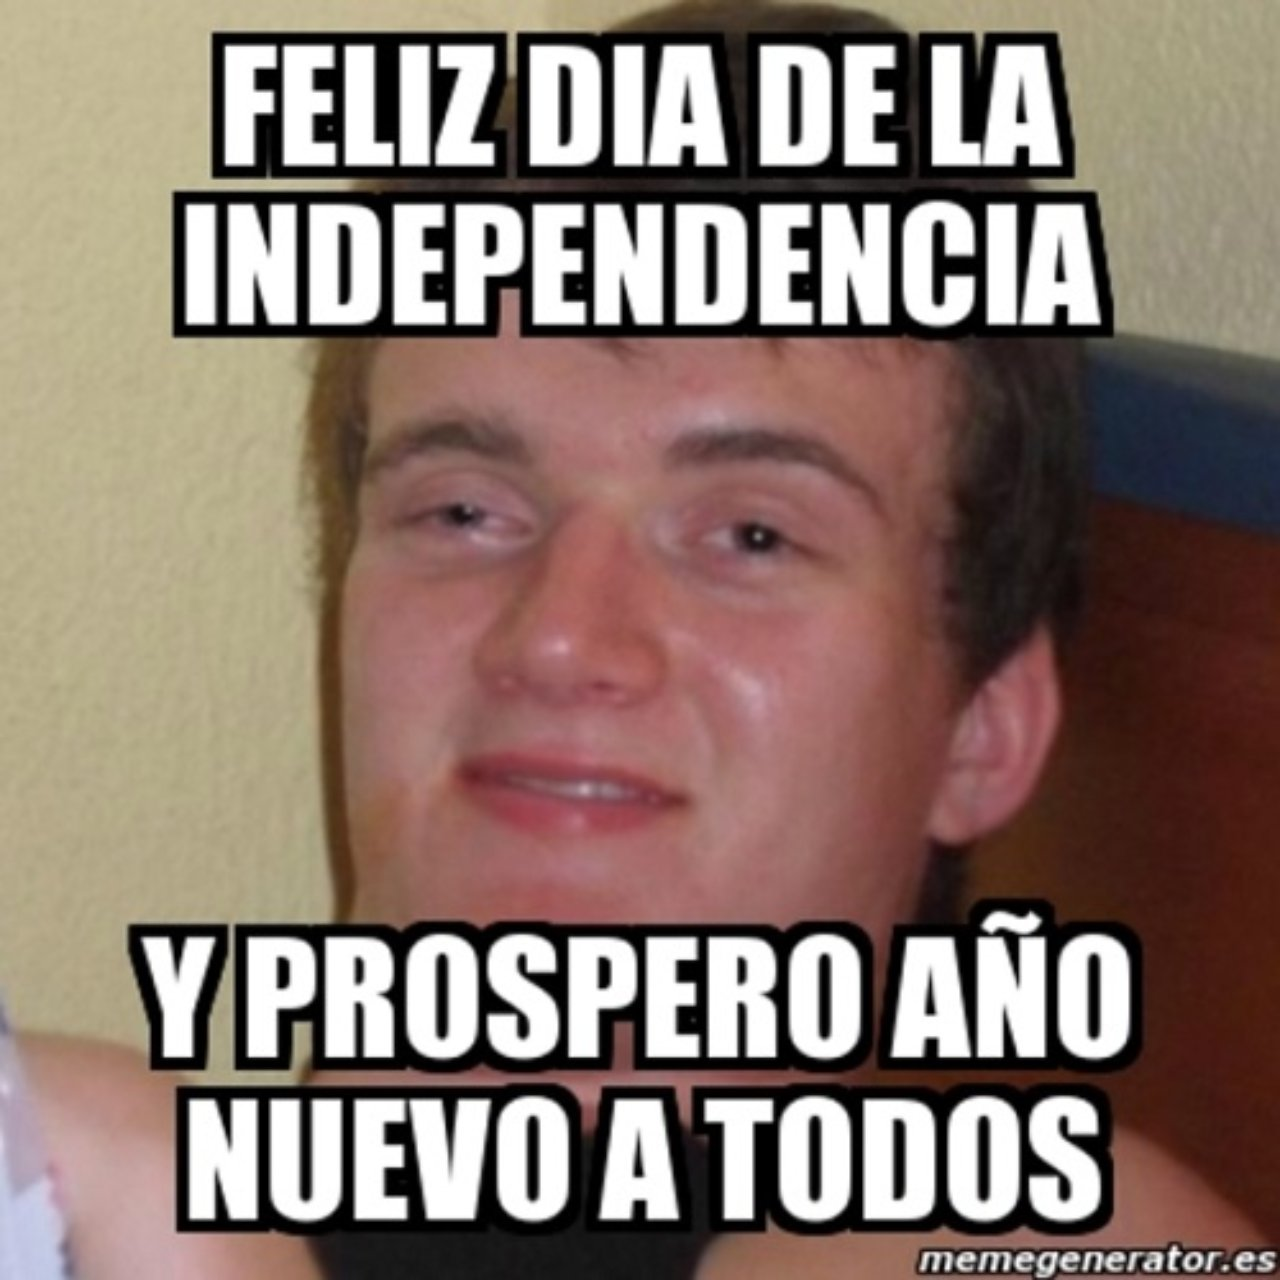 Feliz dia independencia prospero ano meme